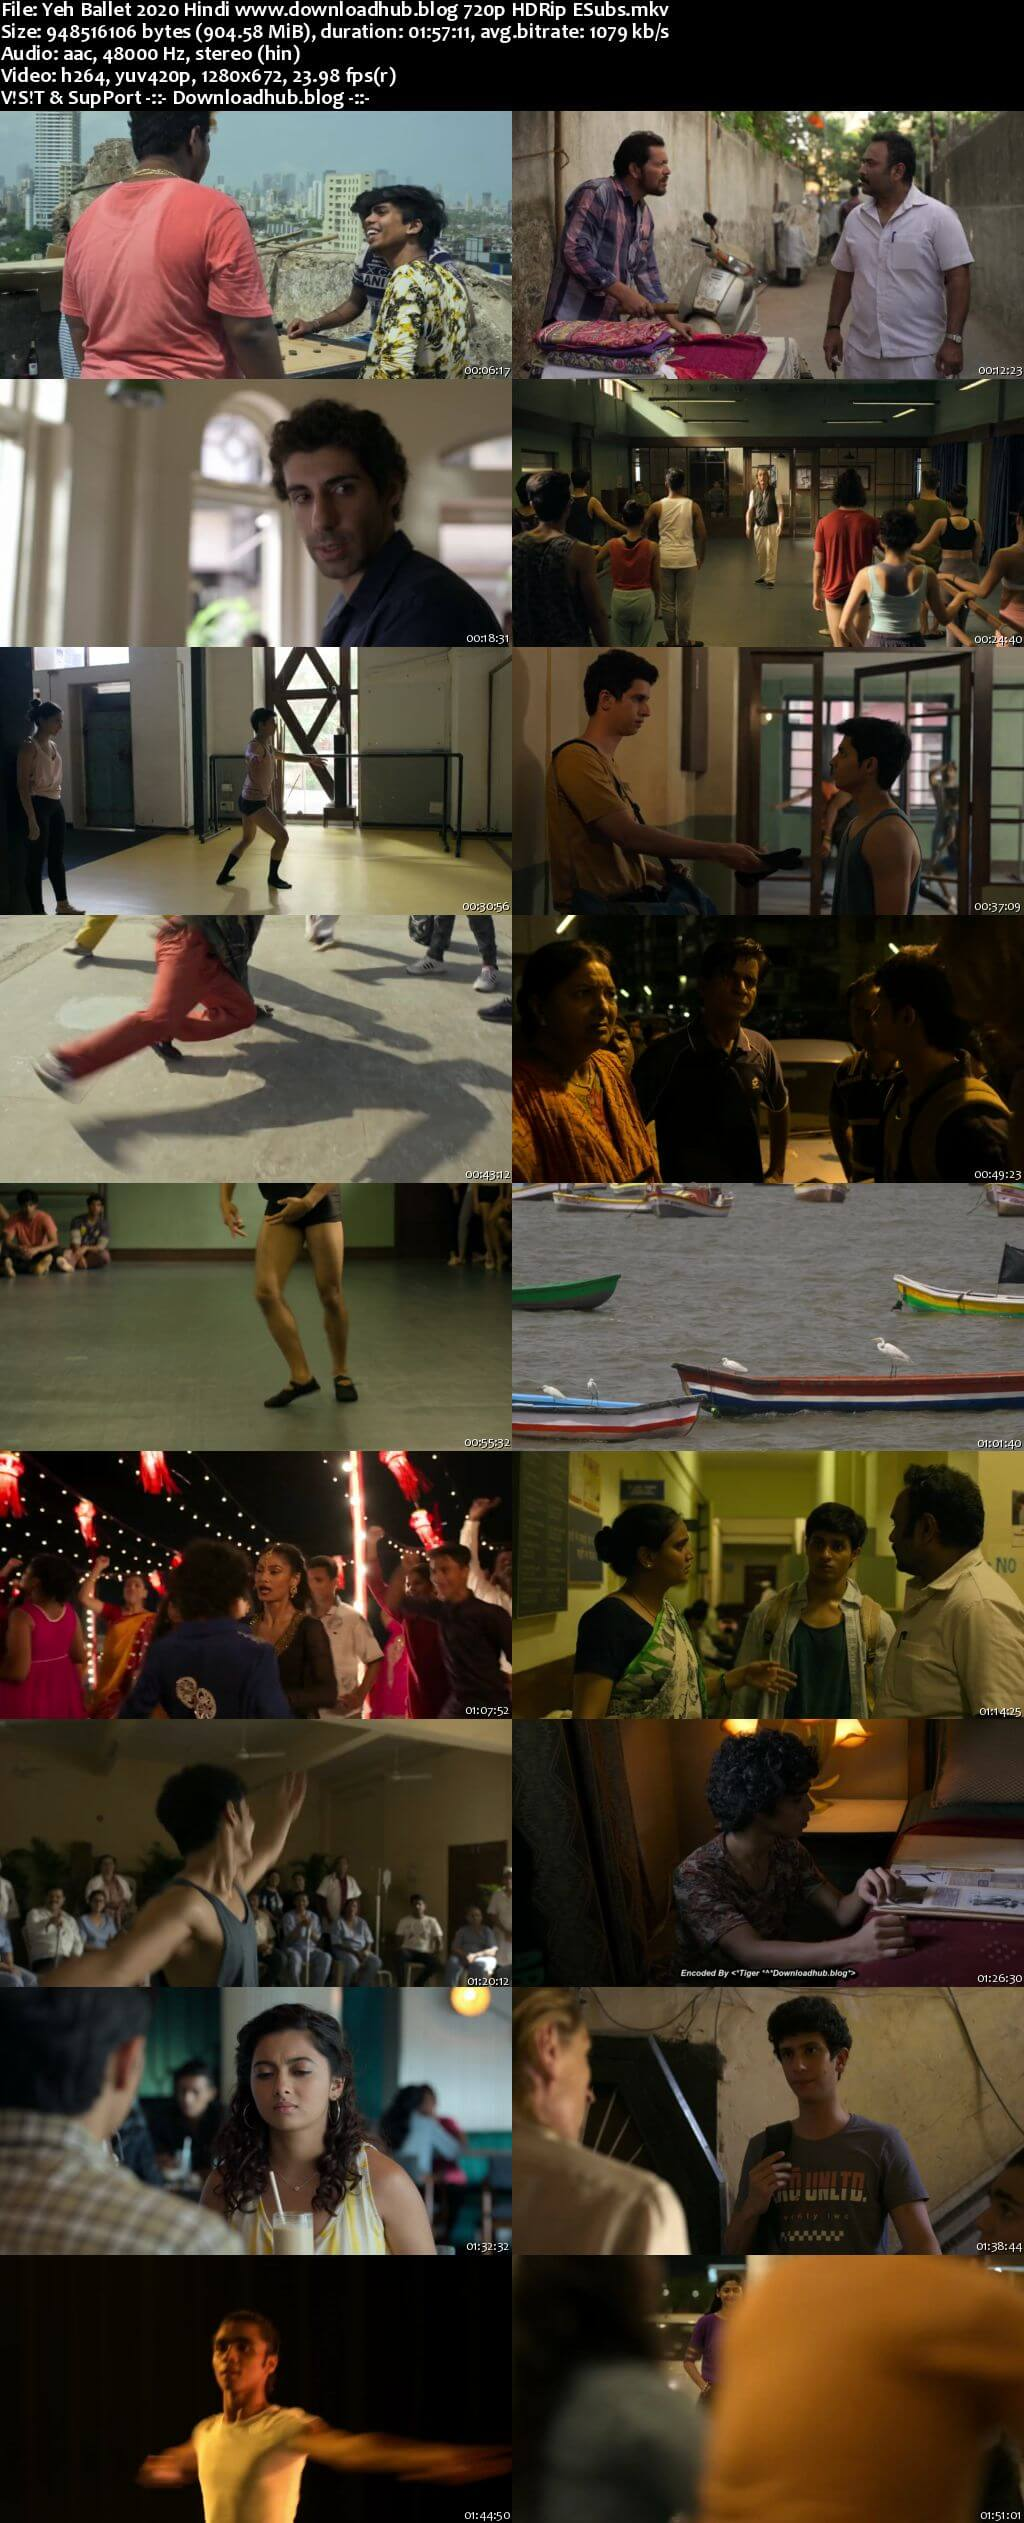 Yeh Ballet 2020 Hindi 720p HDRip ESubs